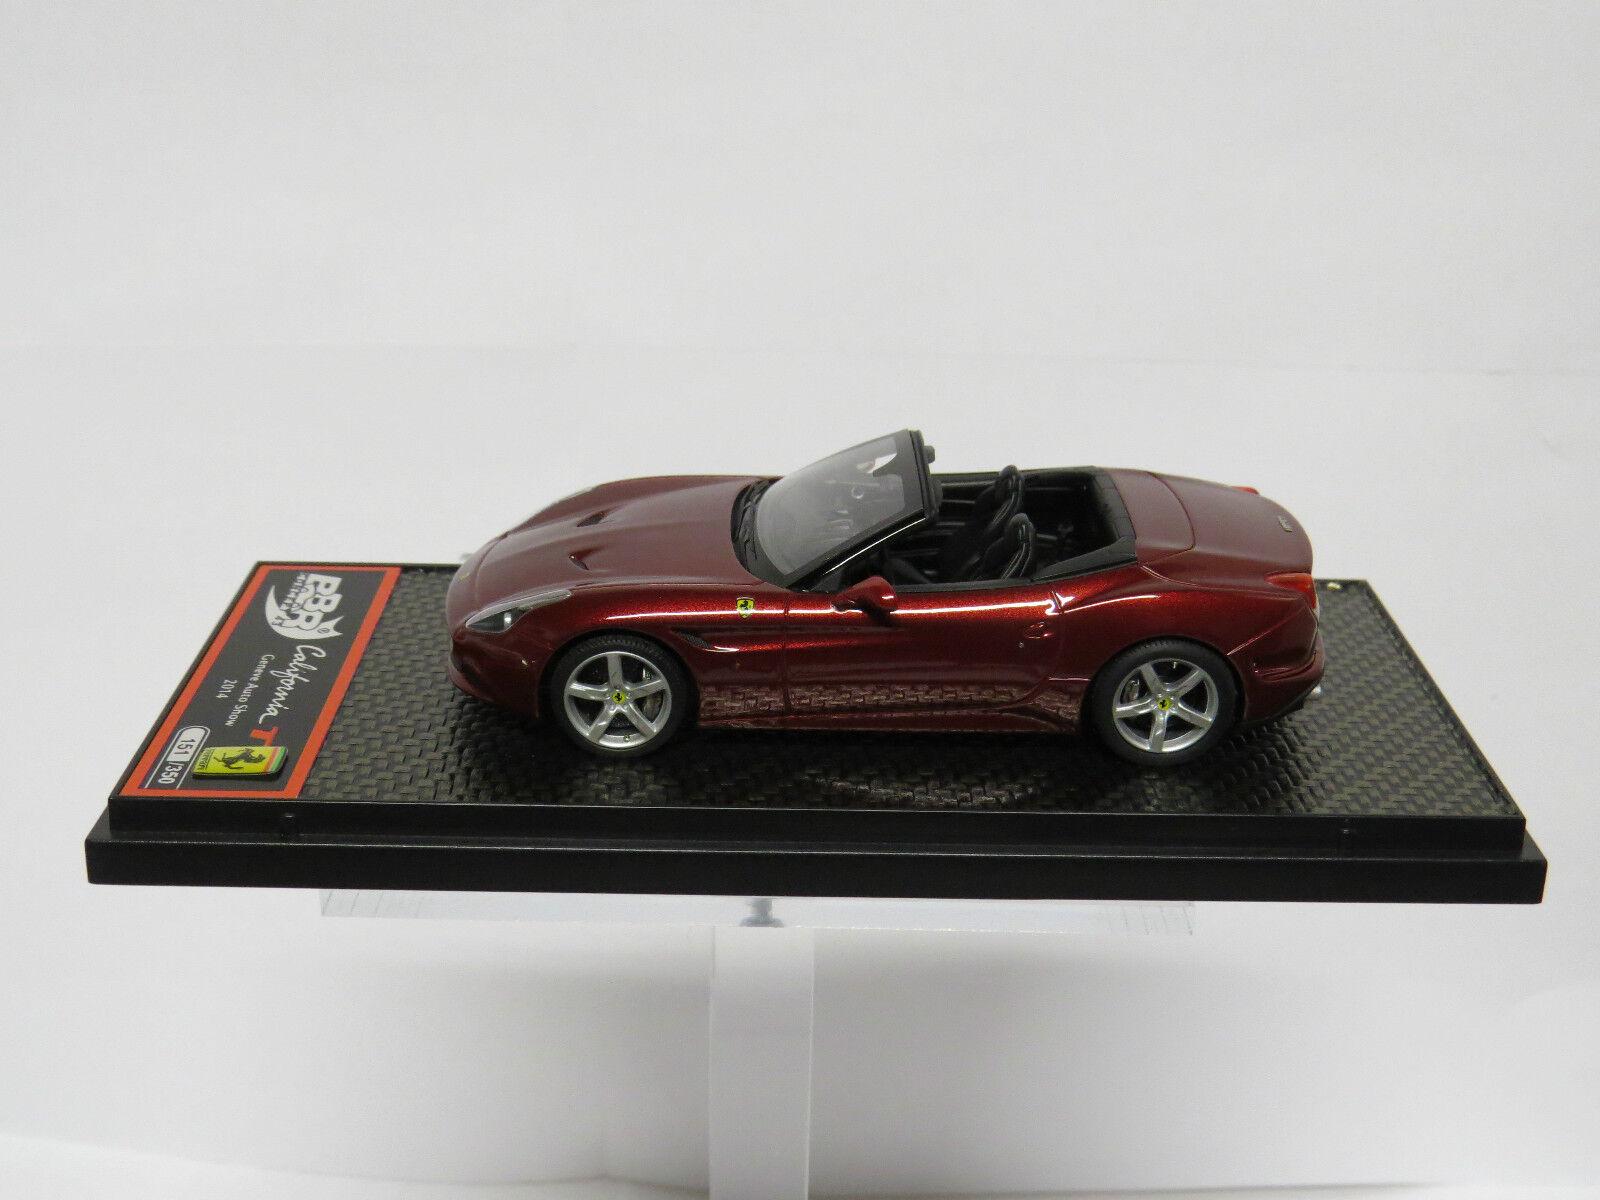 Ferrari California T Rosso California Limited 350 PCS BBR C139